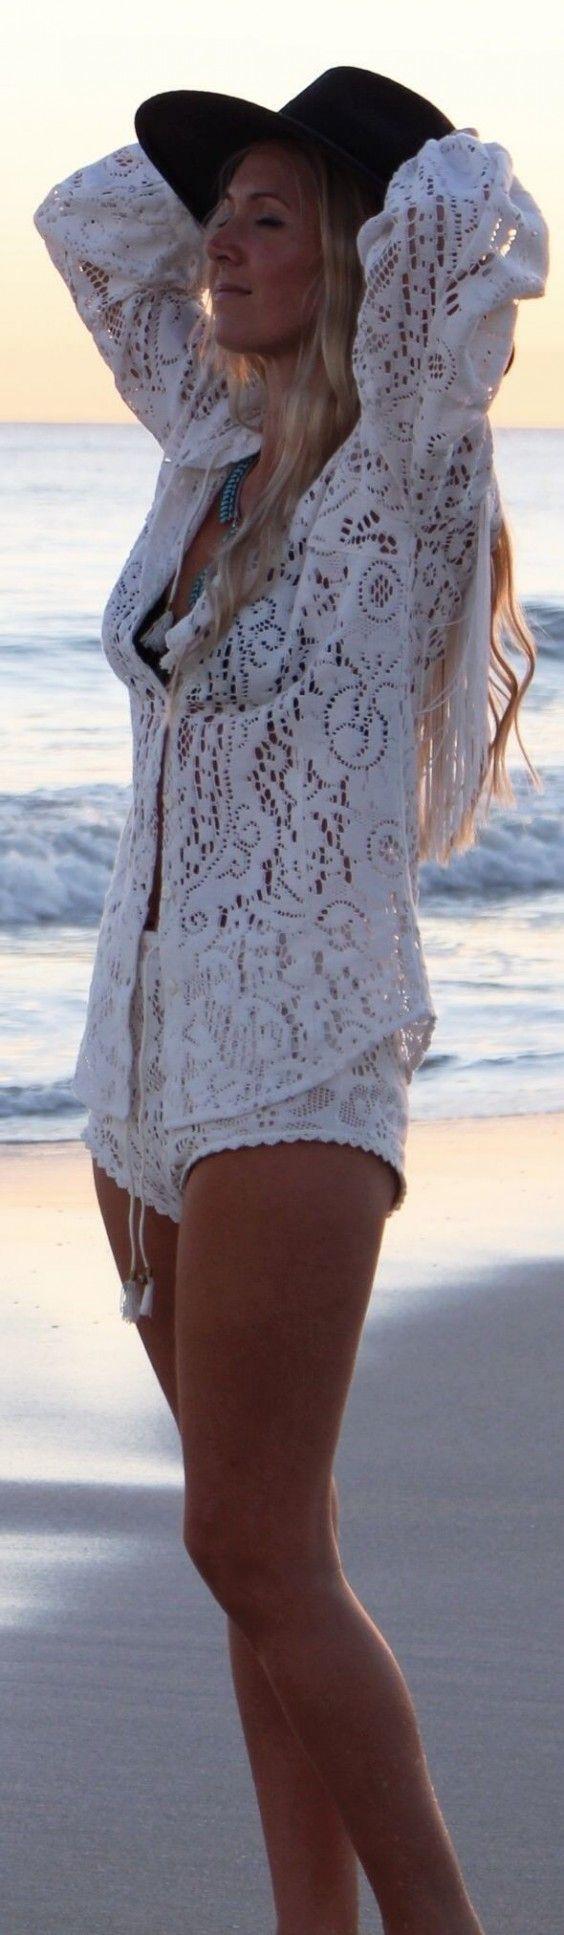 #gypsylovinlight #coachella #hippie #style #spring #summer #inspiration | White Beach Long Sleeve Crochet Semi-sheer Button Up                                                                             Source